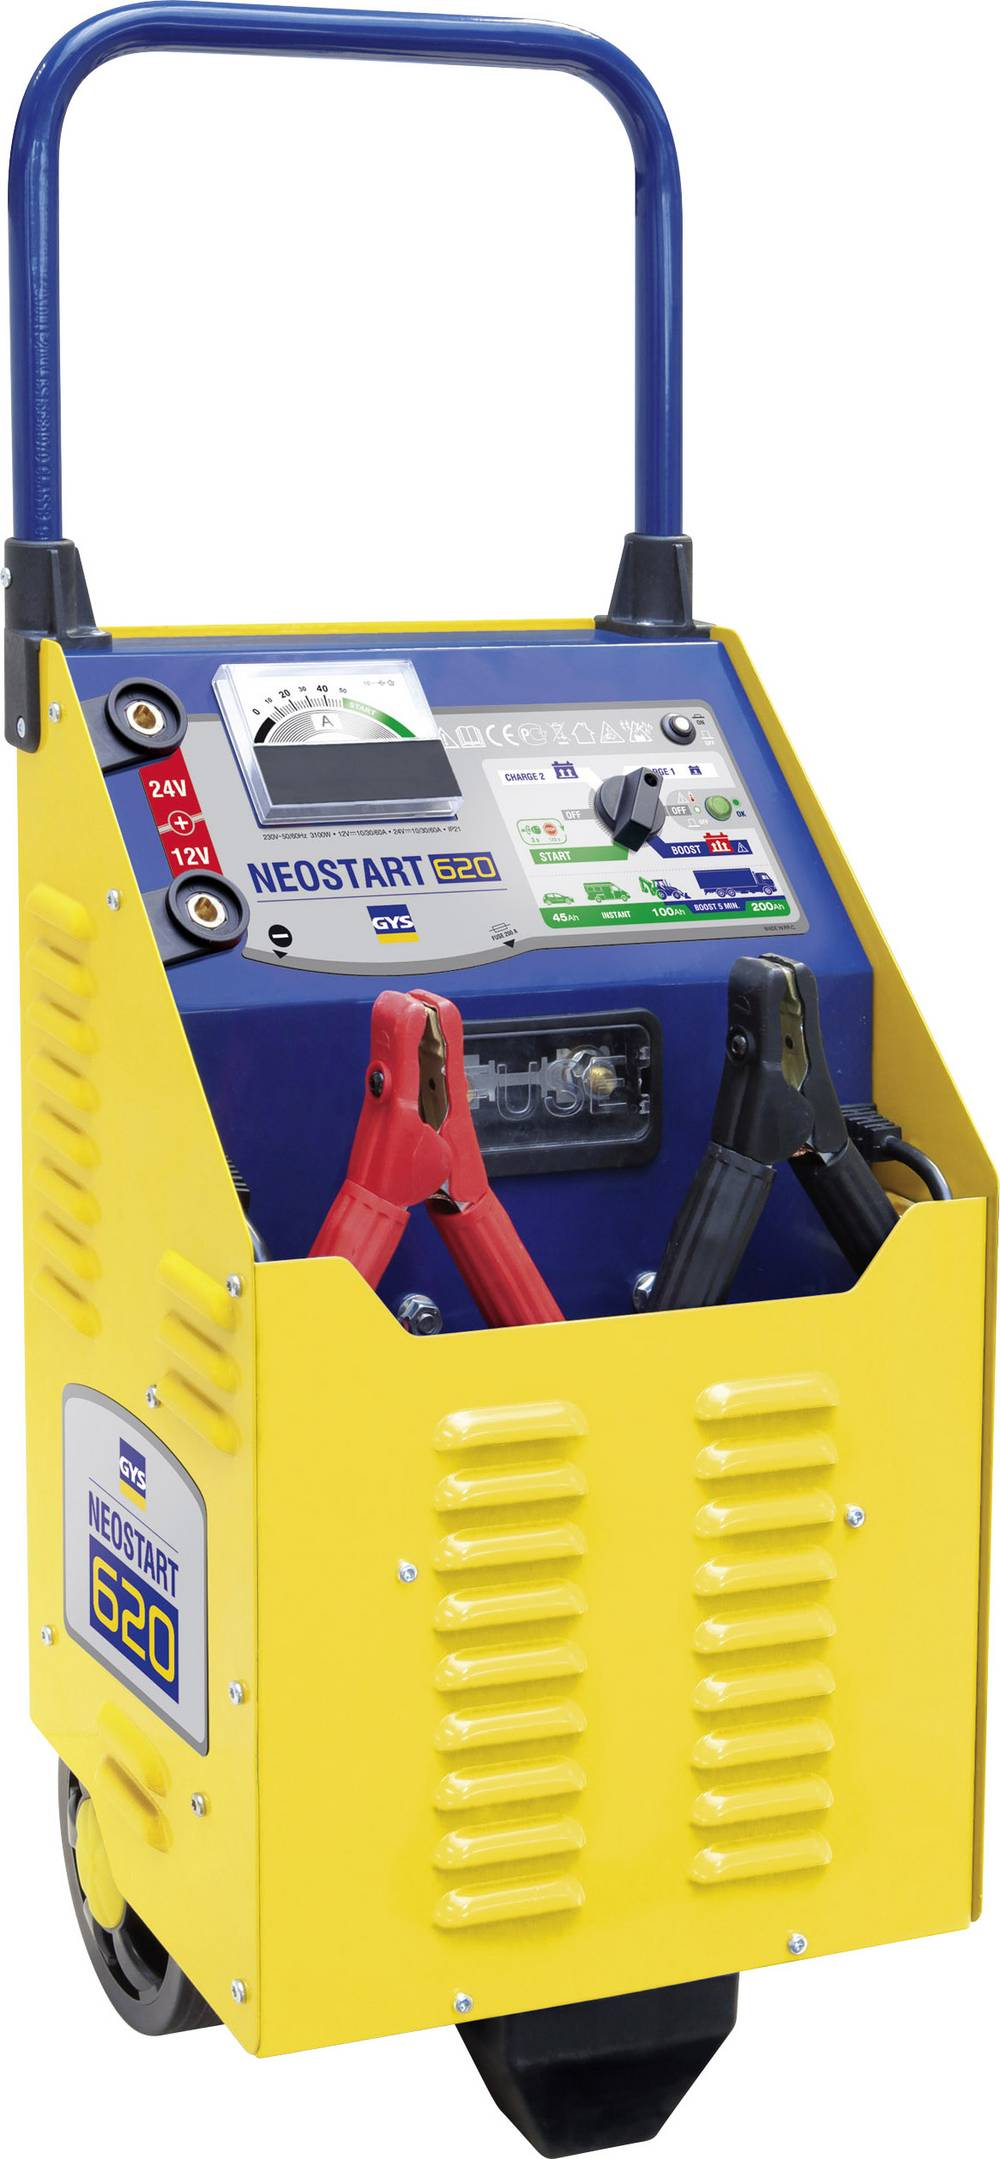 Hurtigstartsystem GYS NEOSTART 620 025288 12 V, 24 V 90 A 90 A